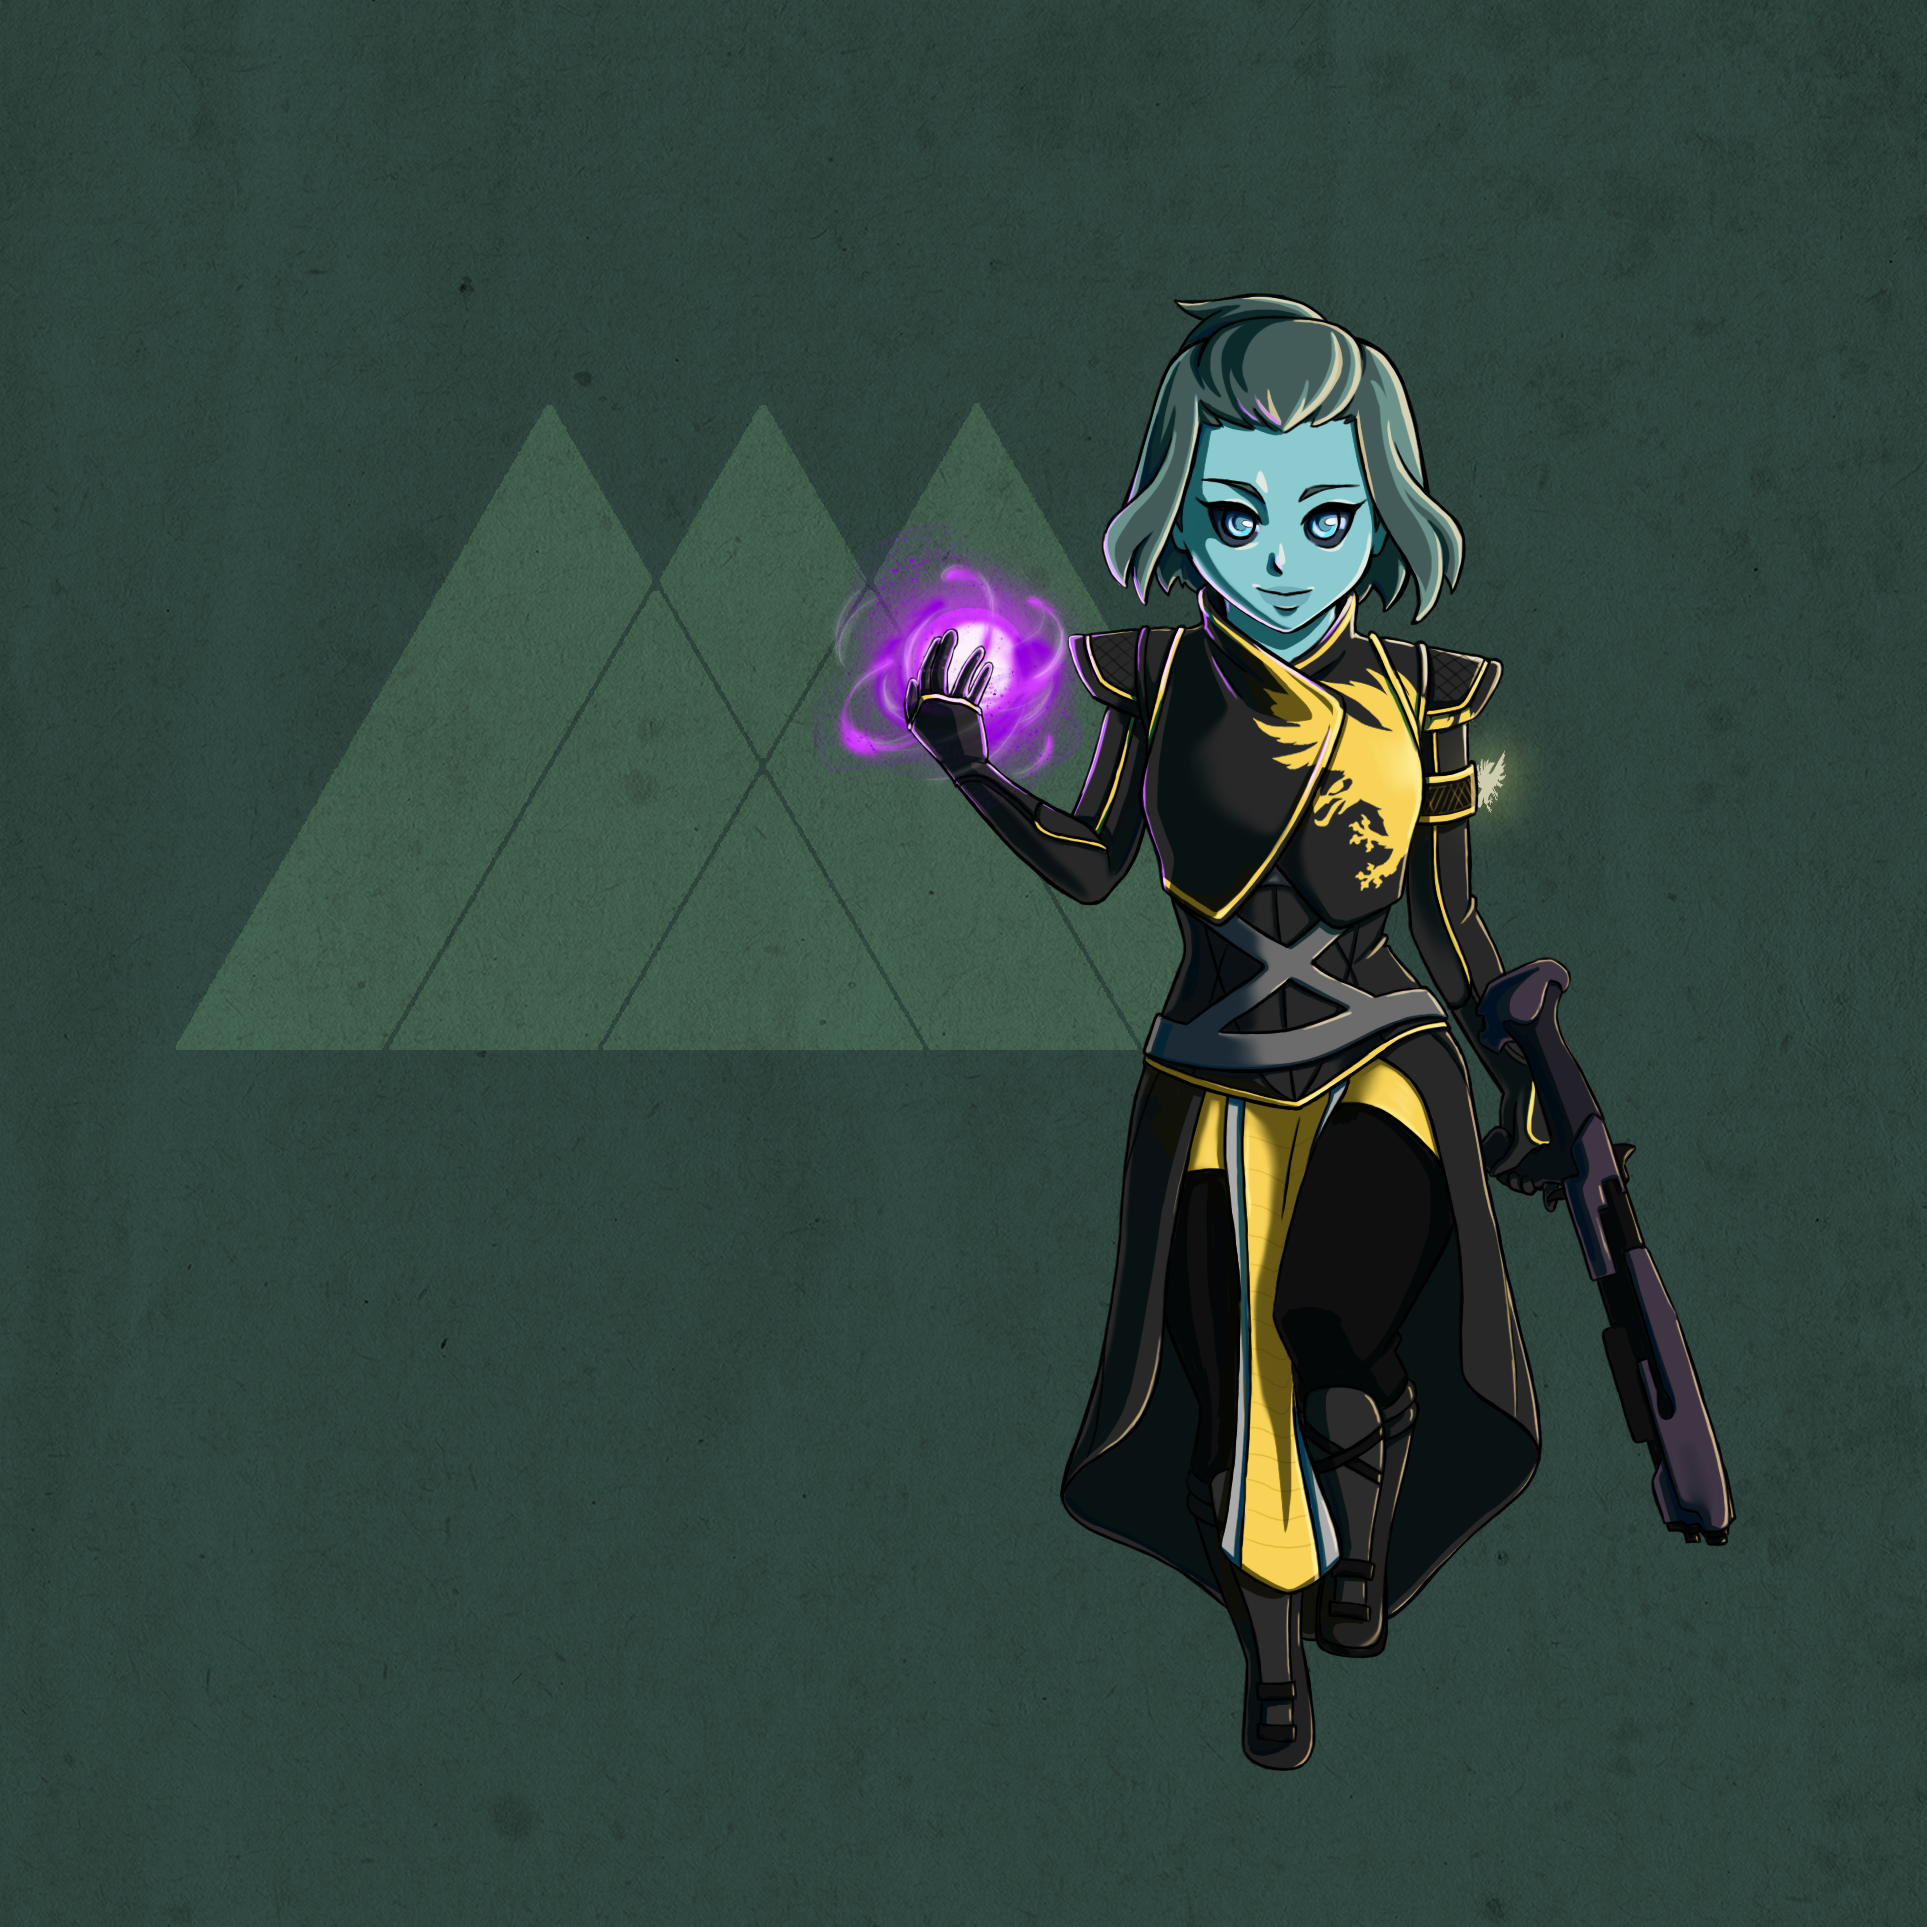 Chibi Warlock